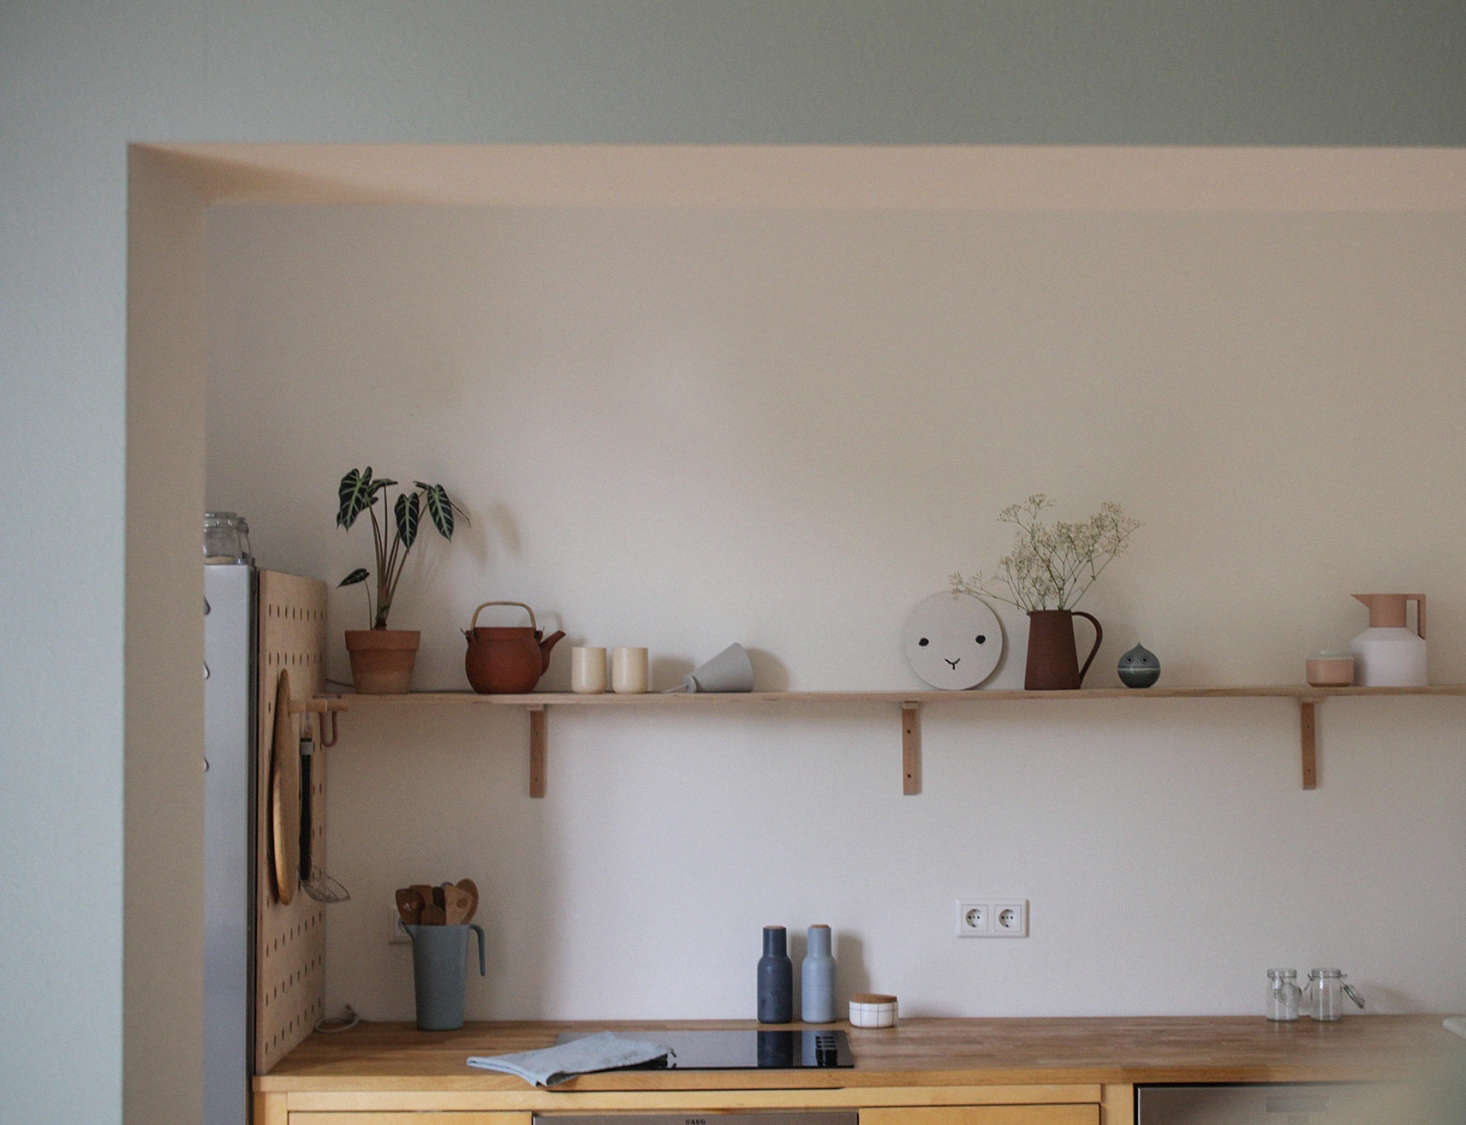 Stylish Ikea Kitchen From Used Ikea Components